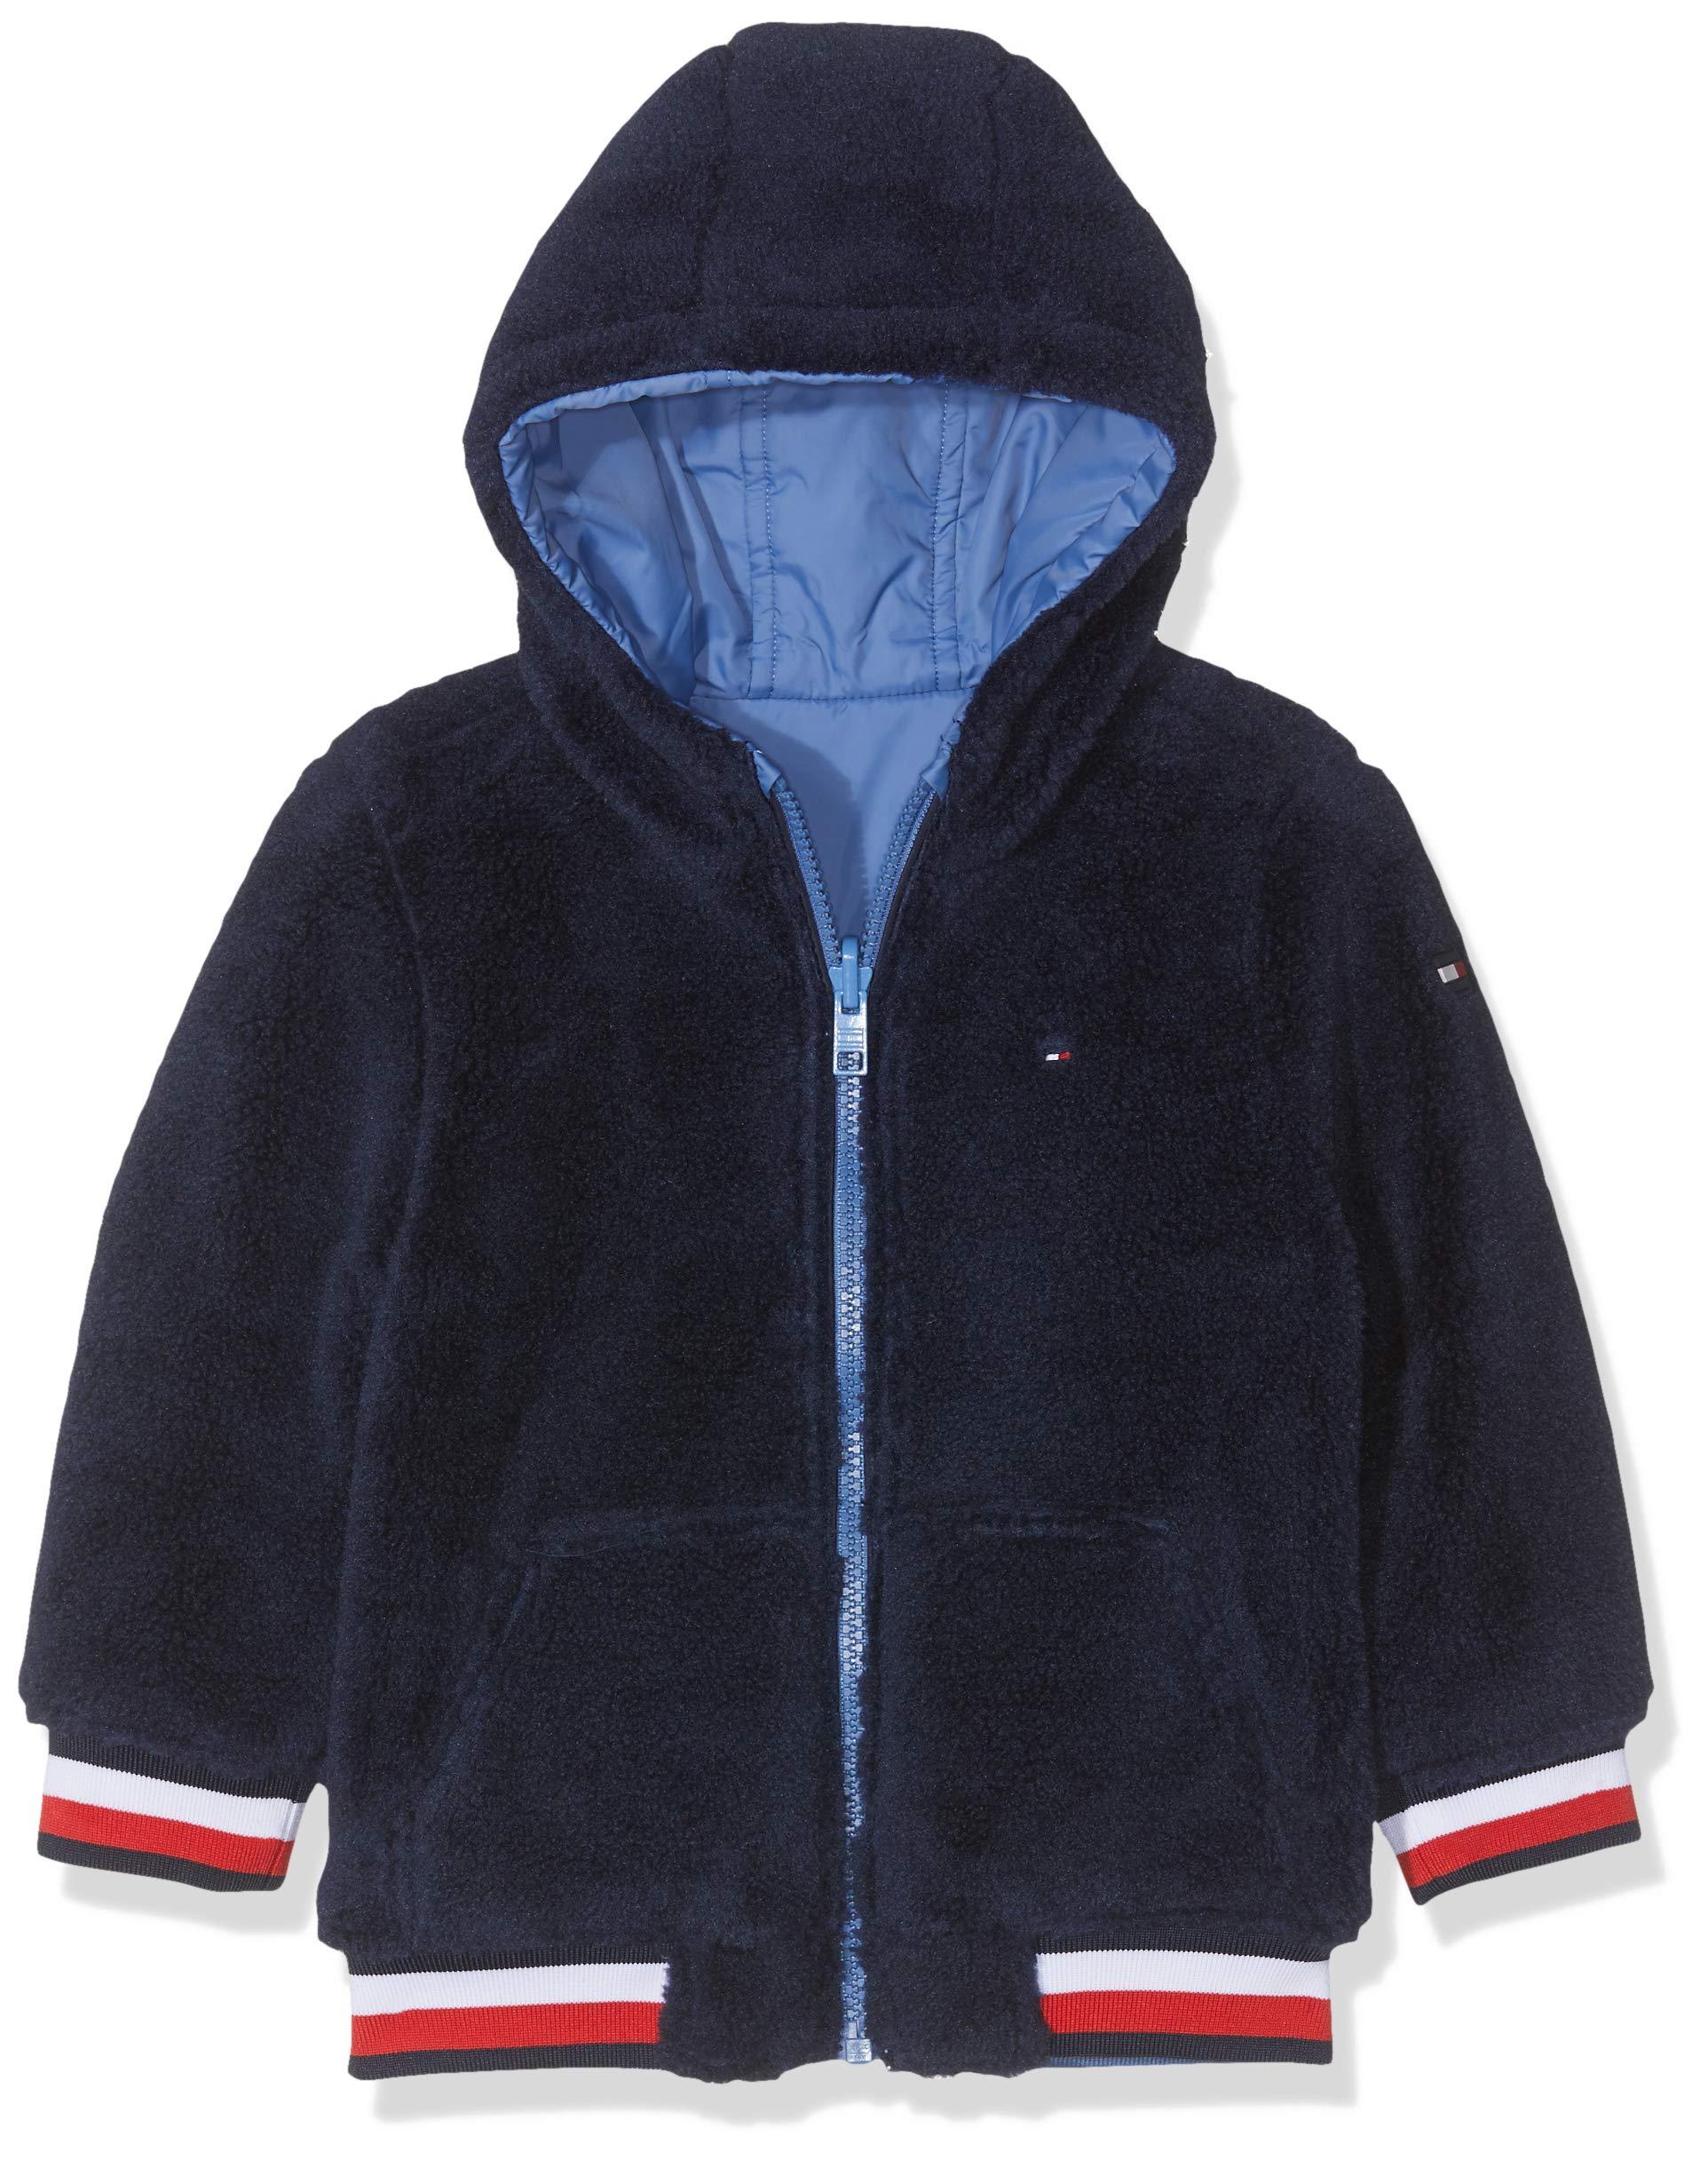 Tommy Hilfiger Reversible Teddy Jacket Chaqueta para Bebés 2